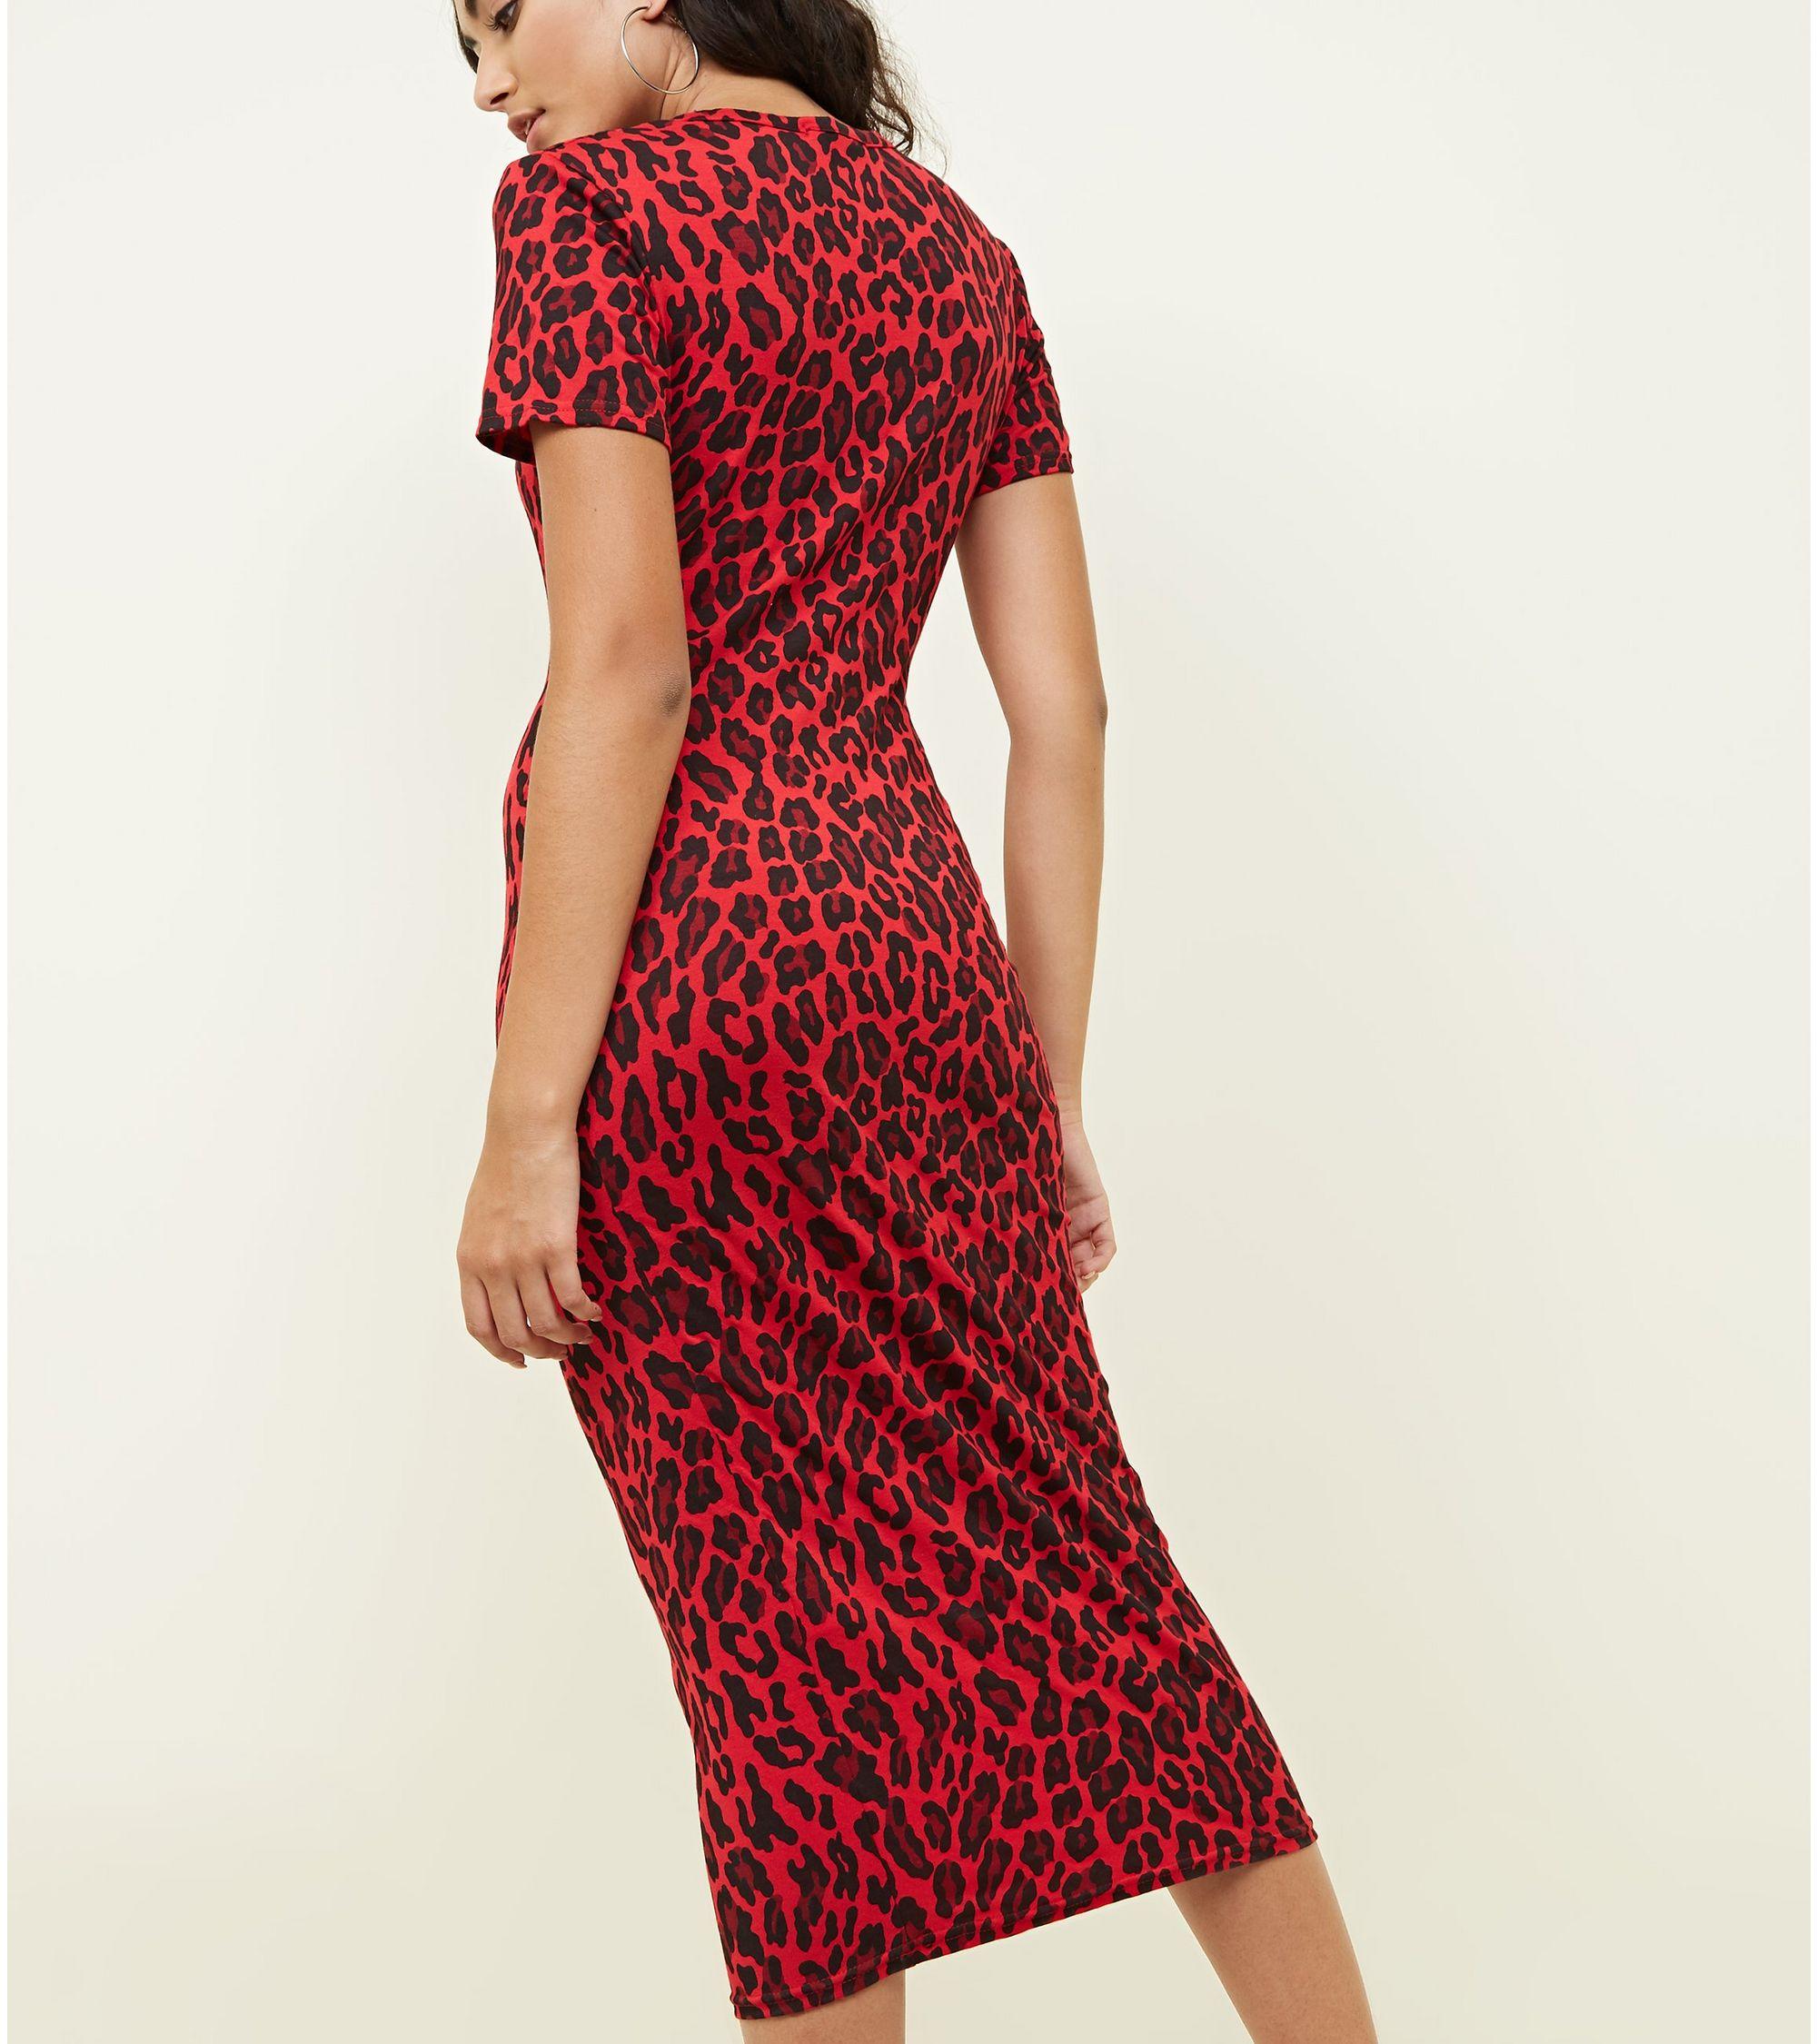 db073686176f New Look Cameo Rose Red Leopard Print Midi Dress at £12   love the ...